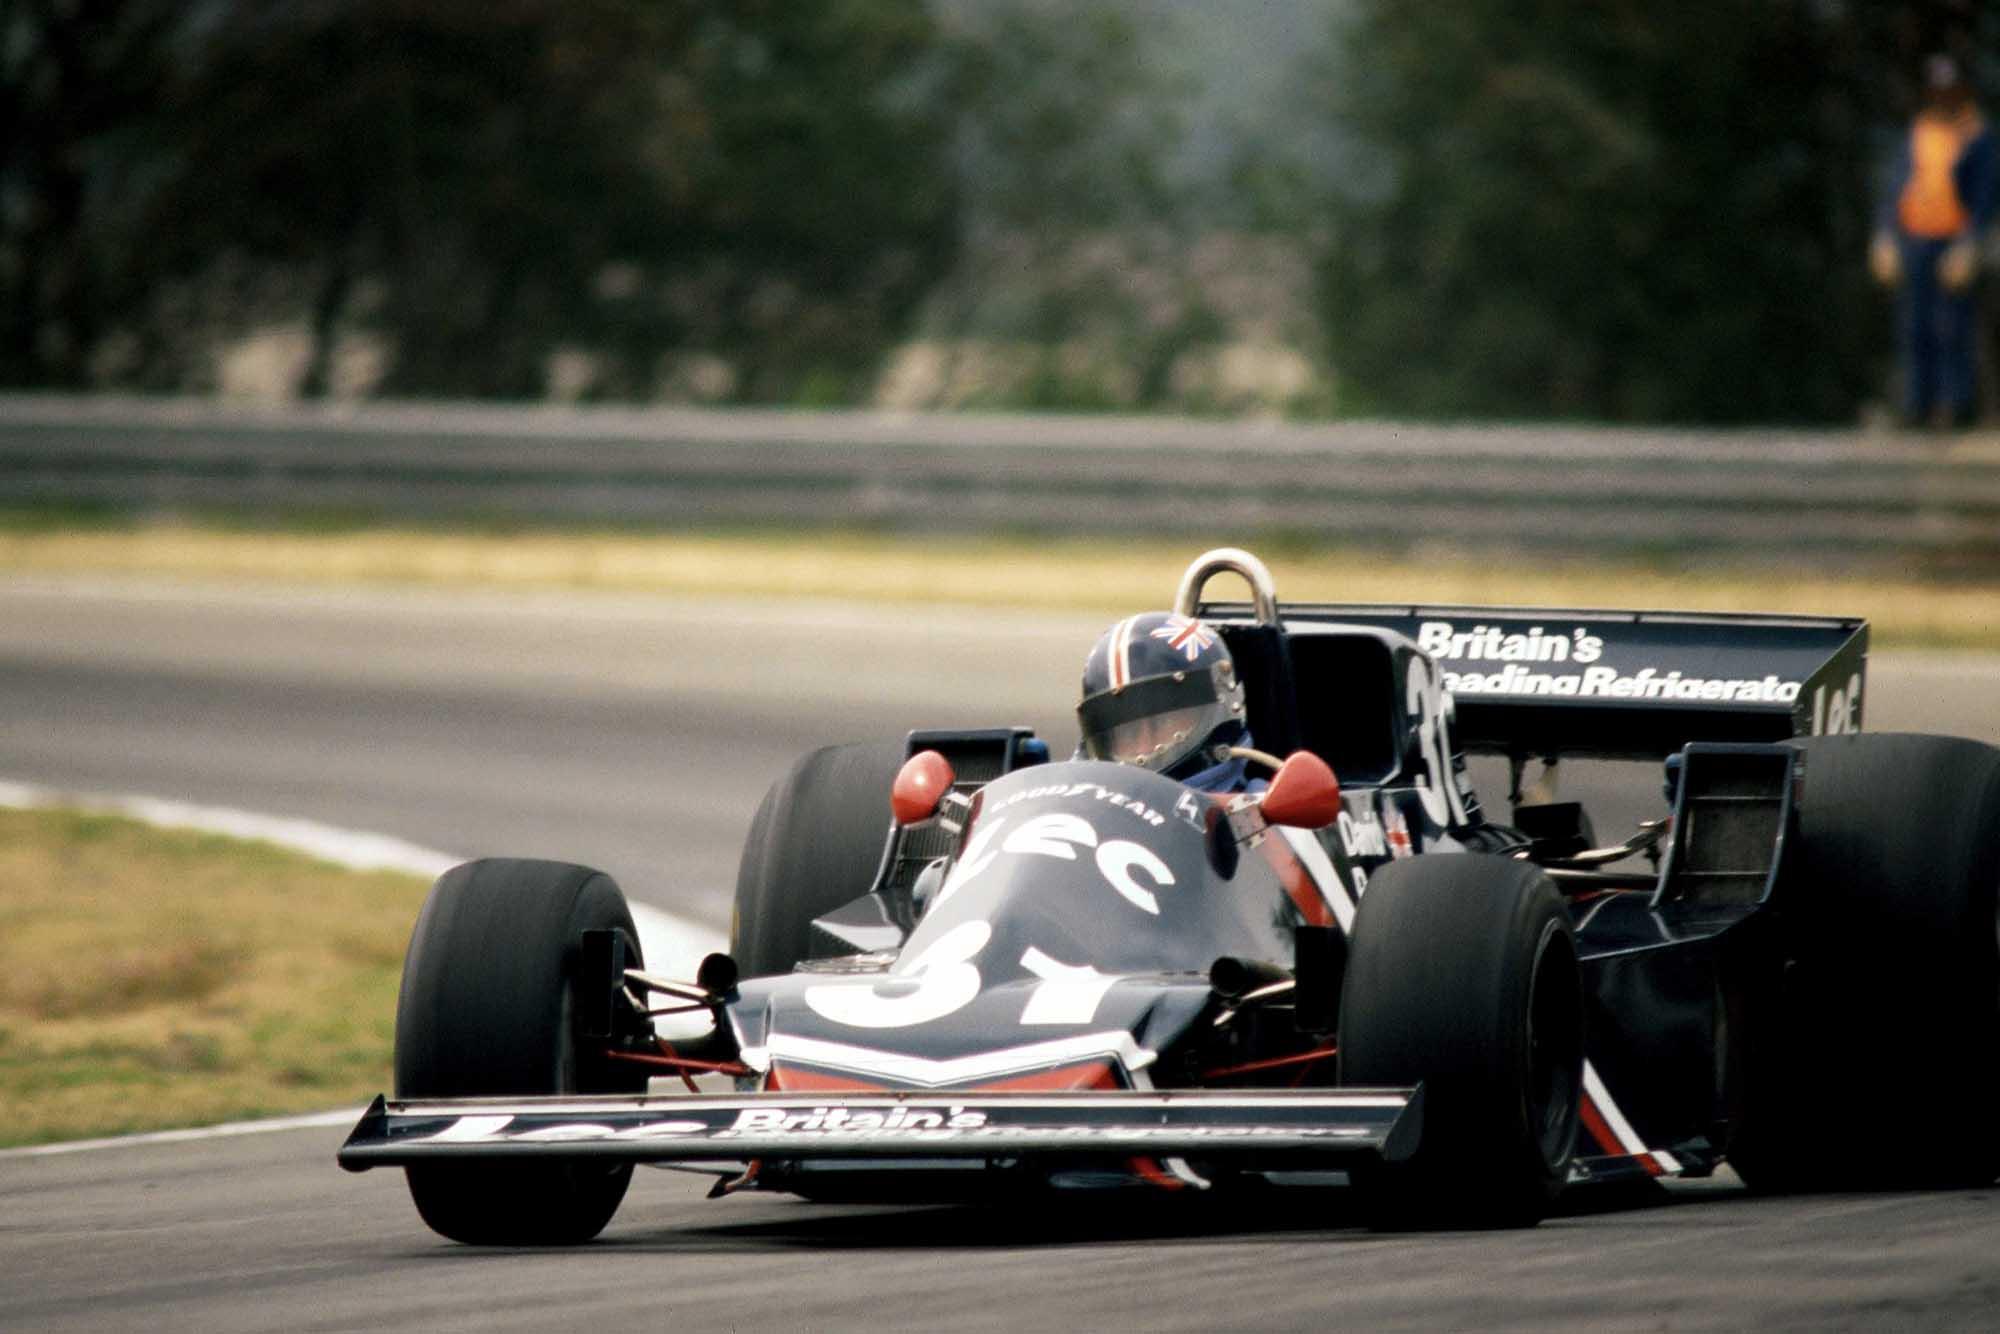 David Purley in his Lec Refrigeration at the 1977 Belgium Grand Prix